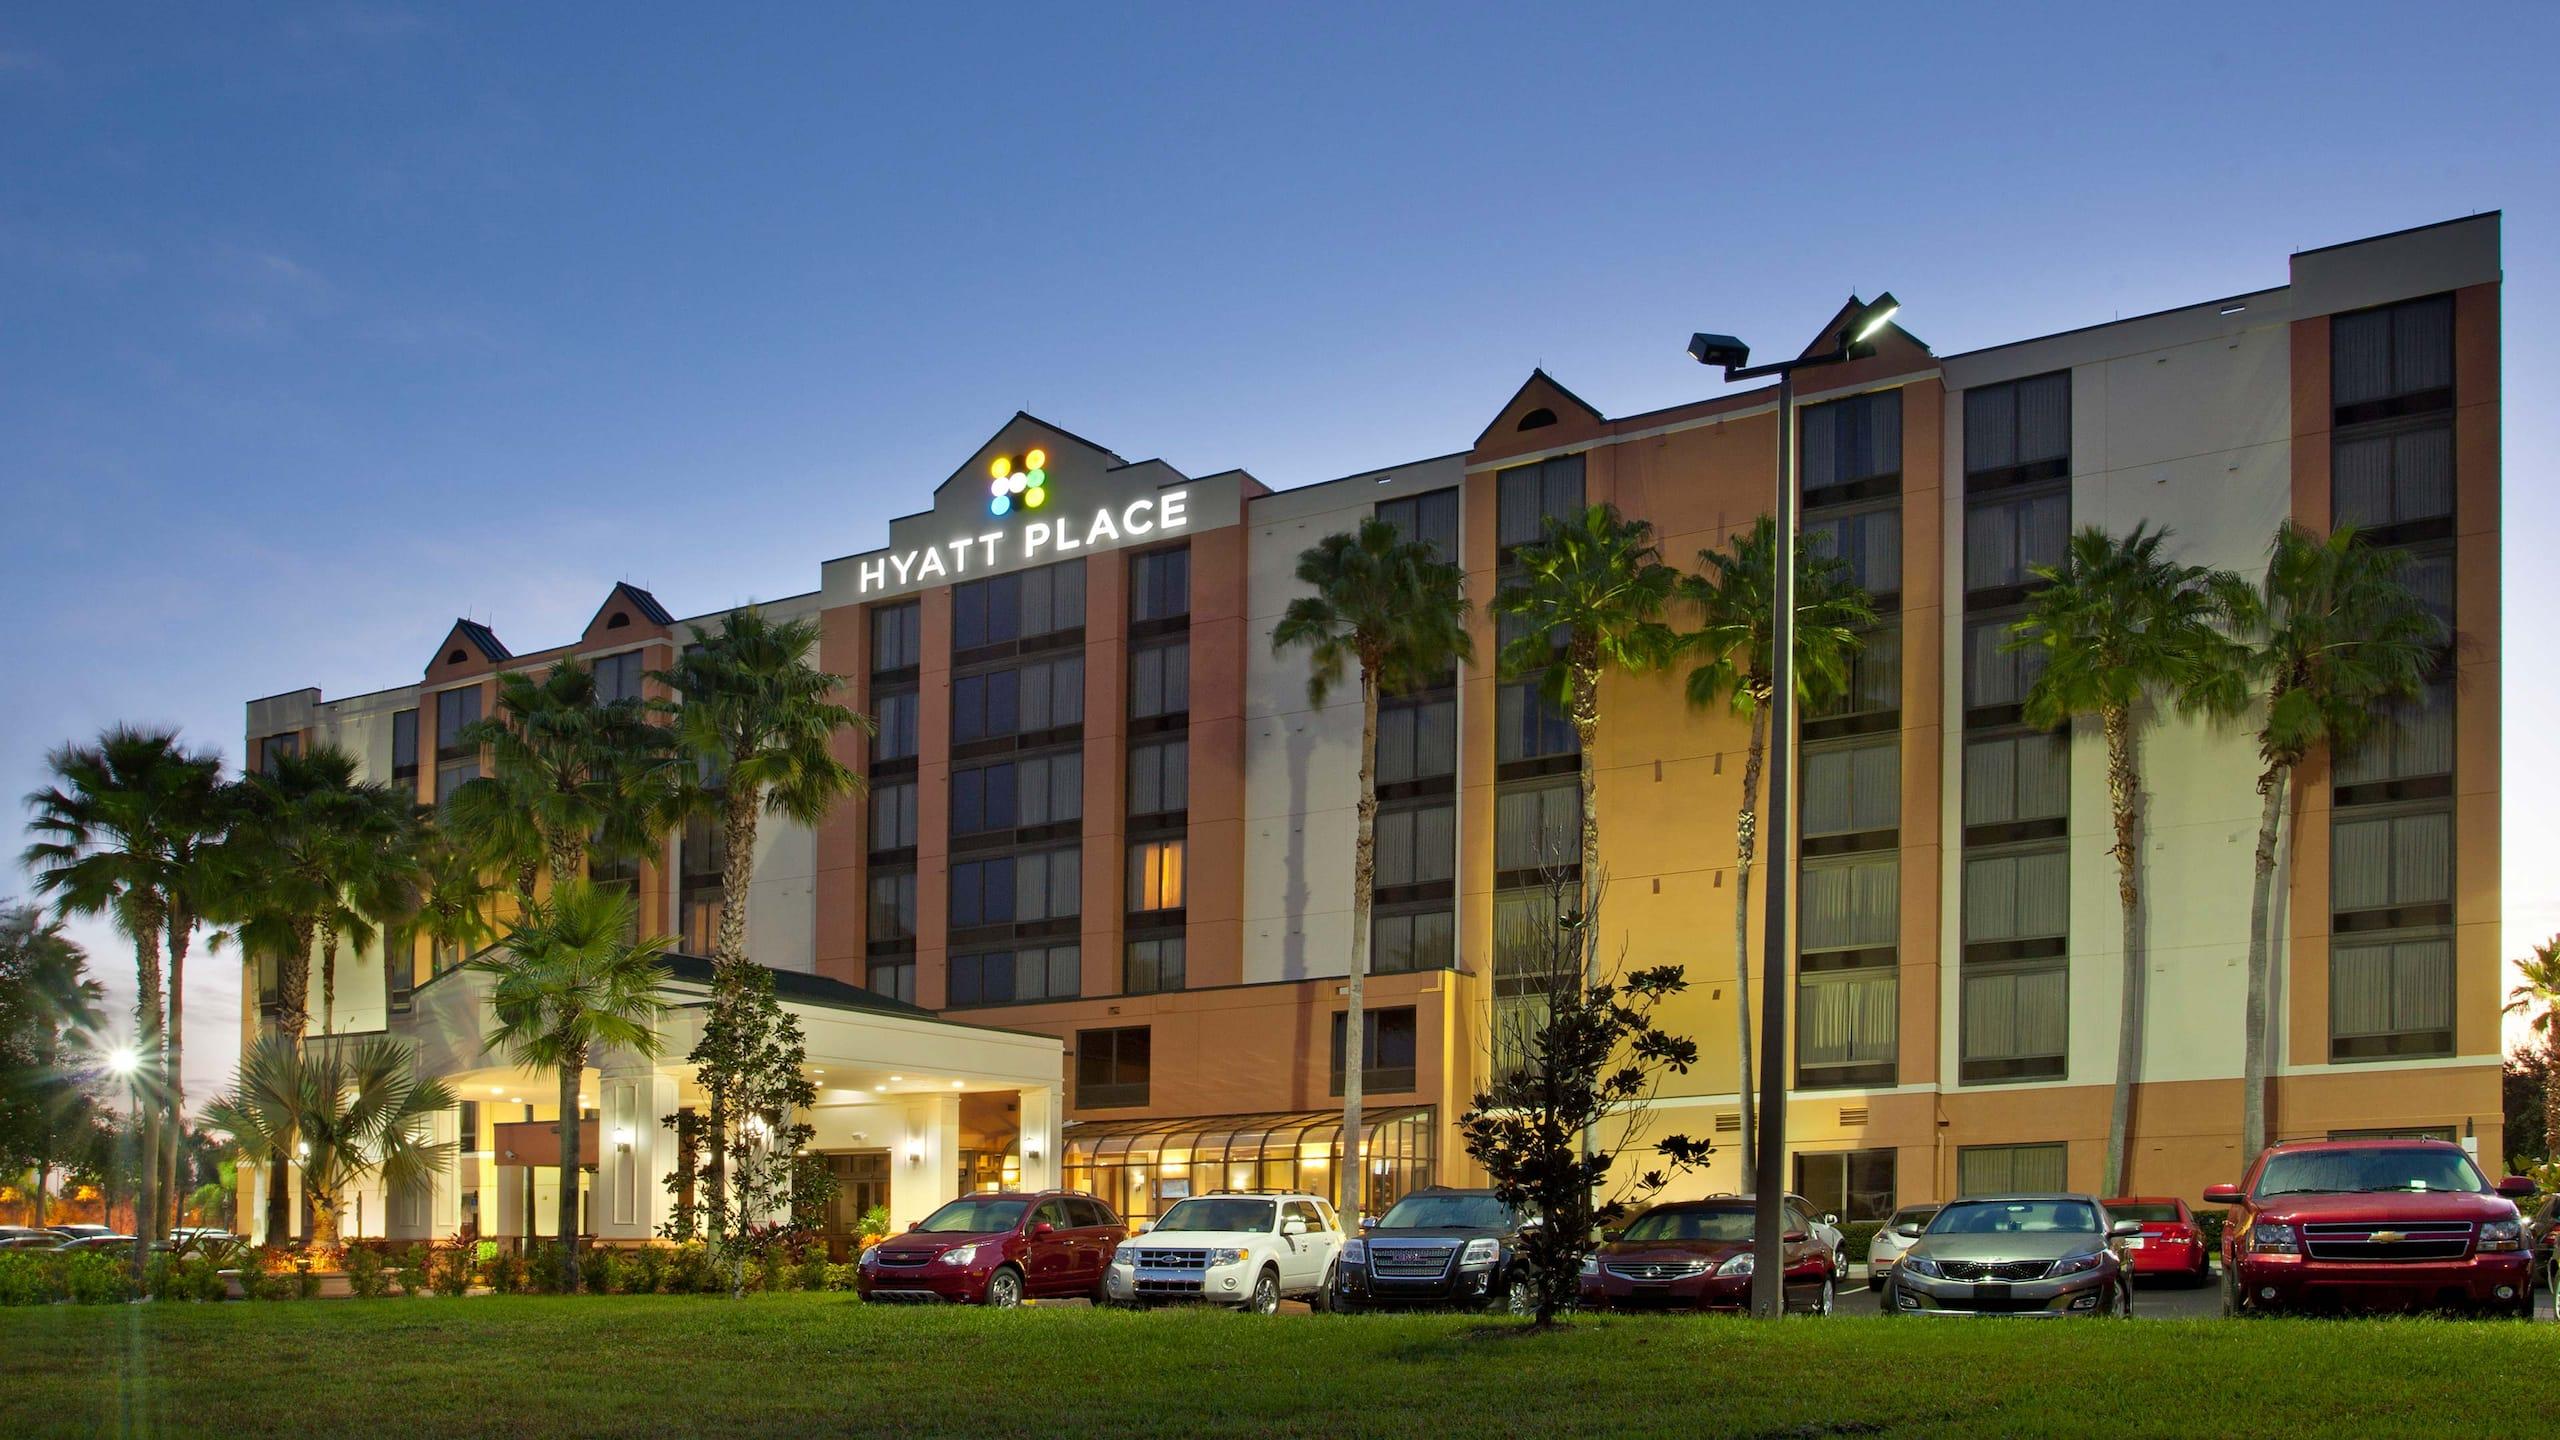 Hotels Near Universal Studios >> Hotels Near Universal Studios Hyatt Place Across From